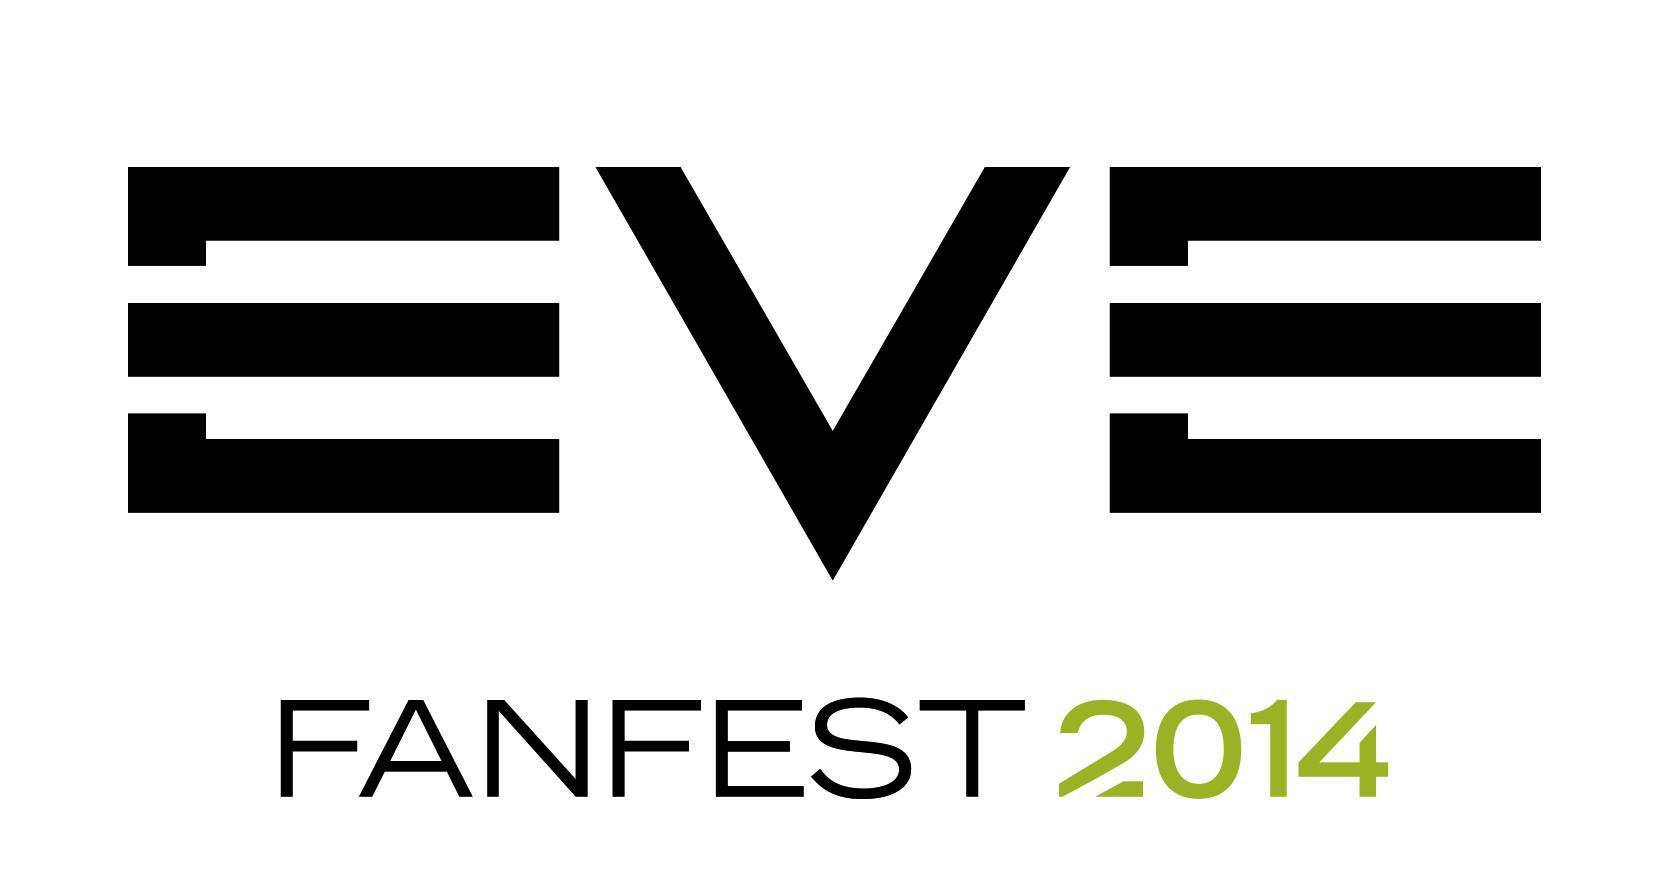 EVE Fanfest 2014 logo